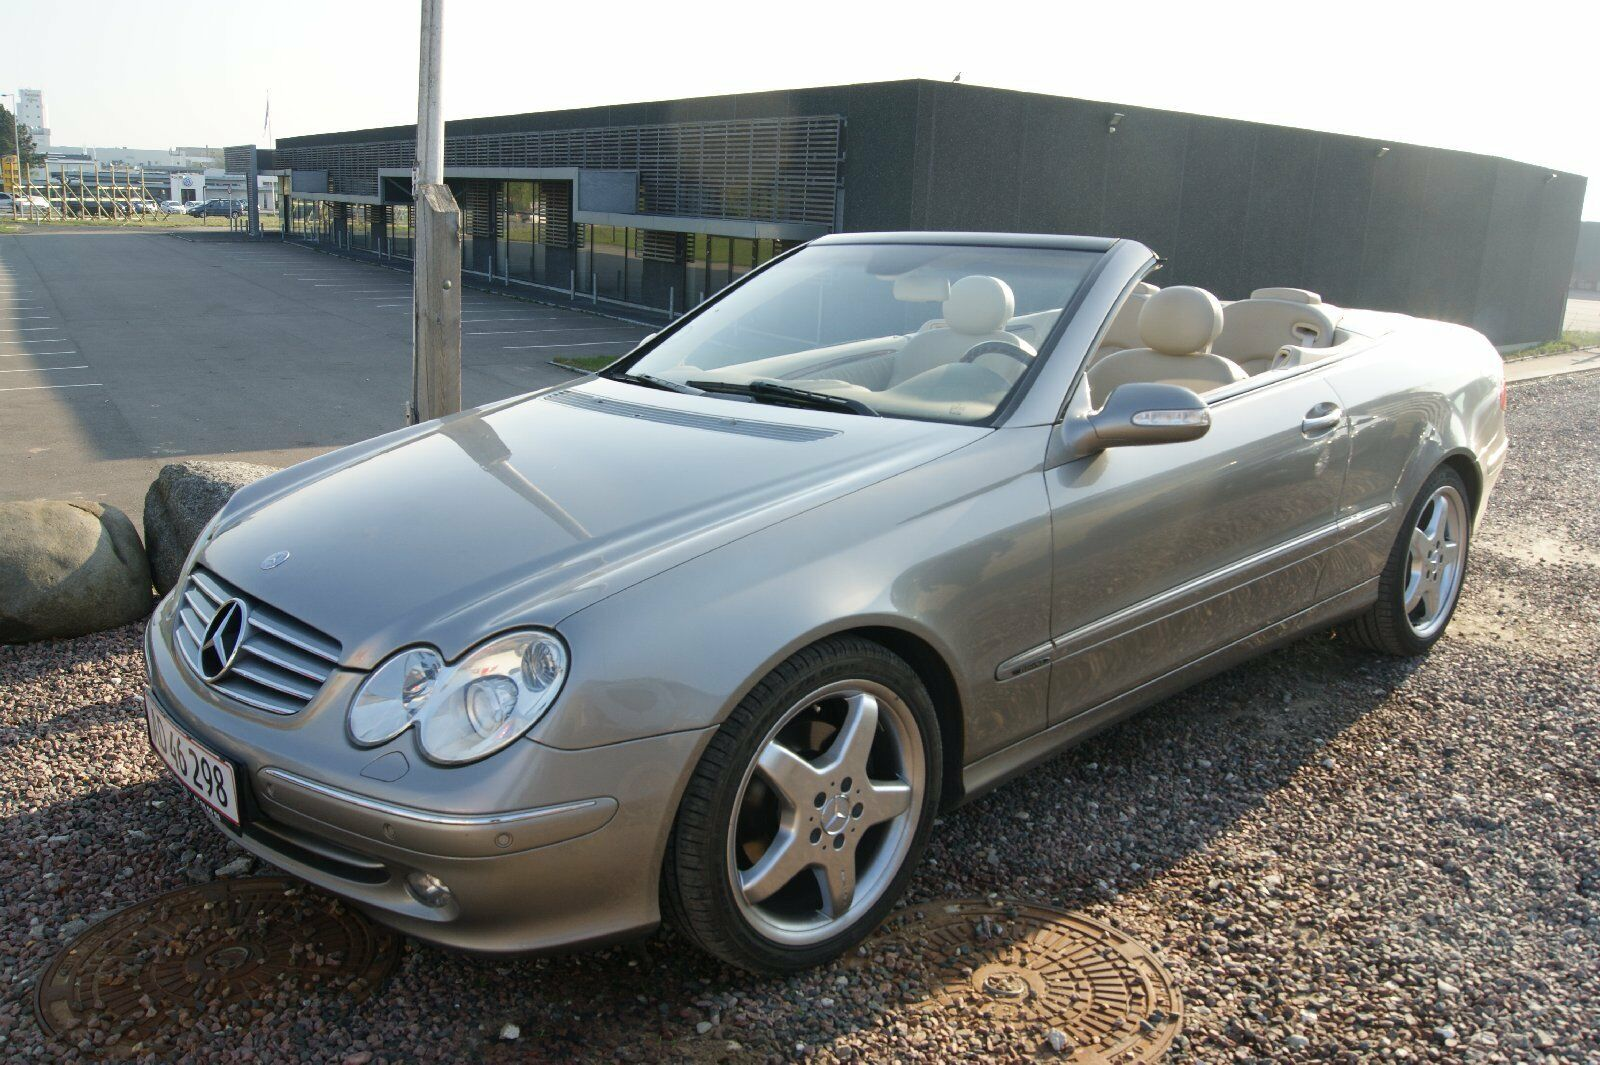 Mercedes CLK320 3,2 Cabriolet Elegance aut. 2d - 299.900 kr.